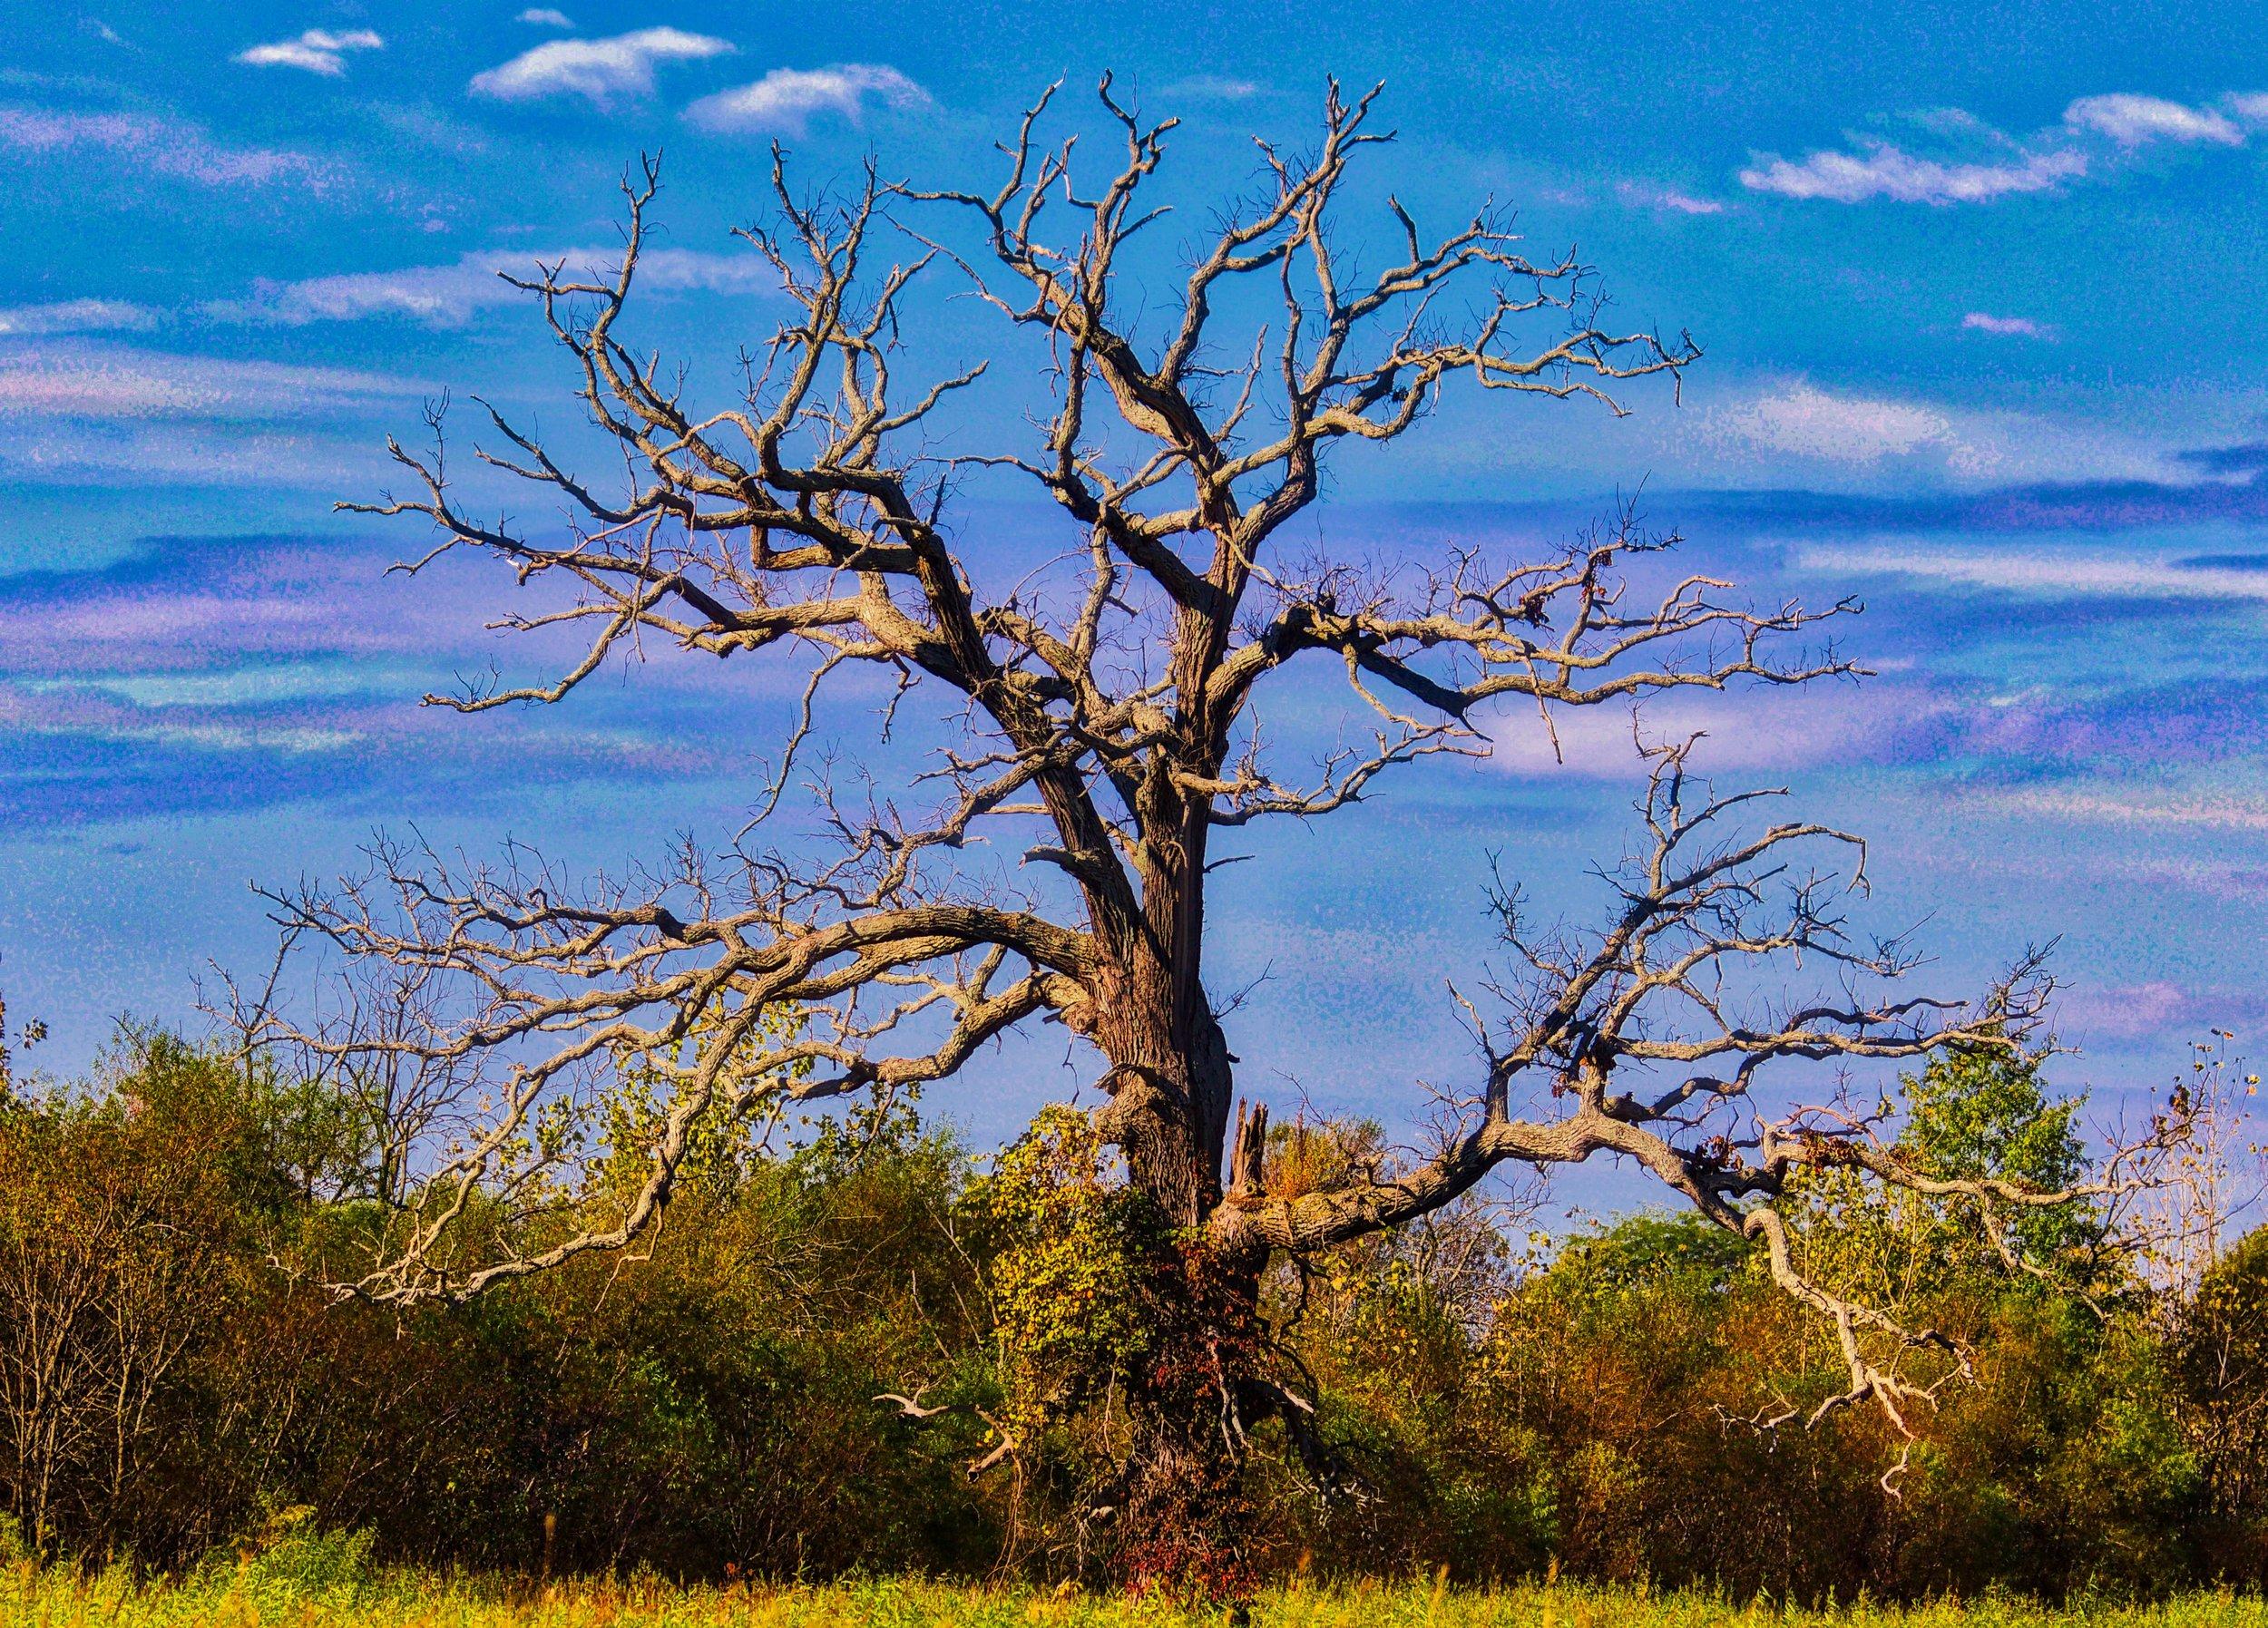 A Favorite Tree